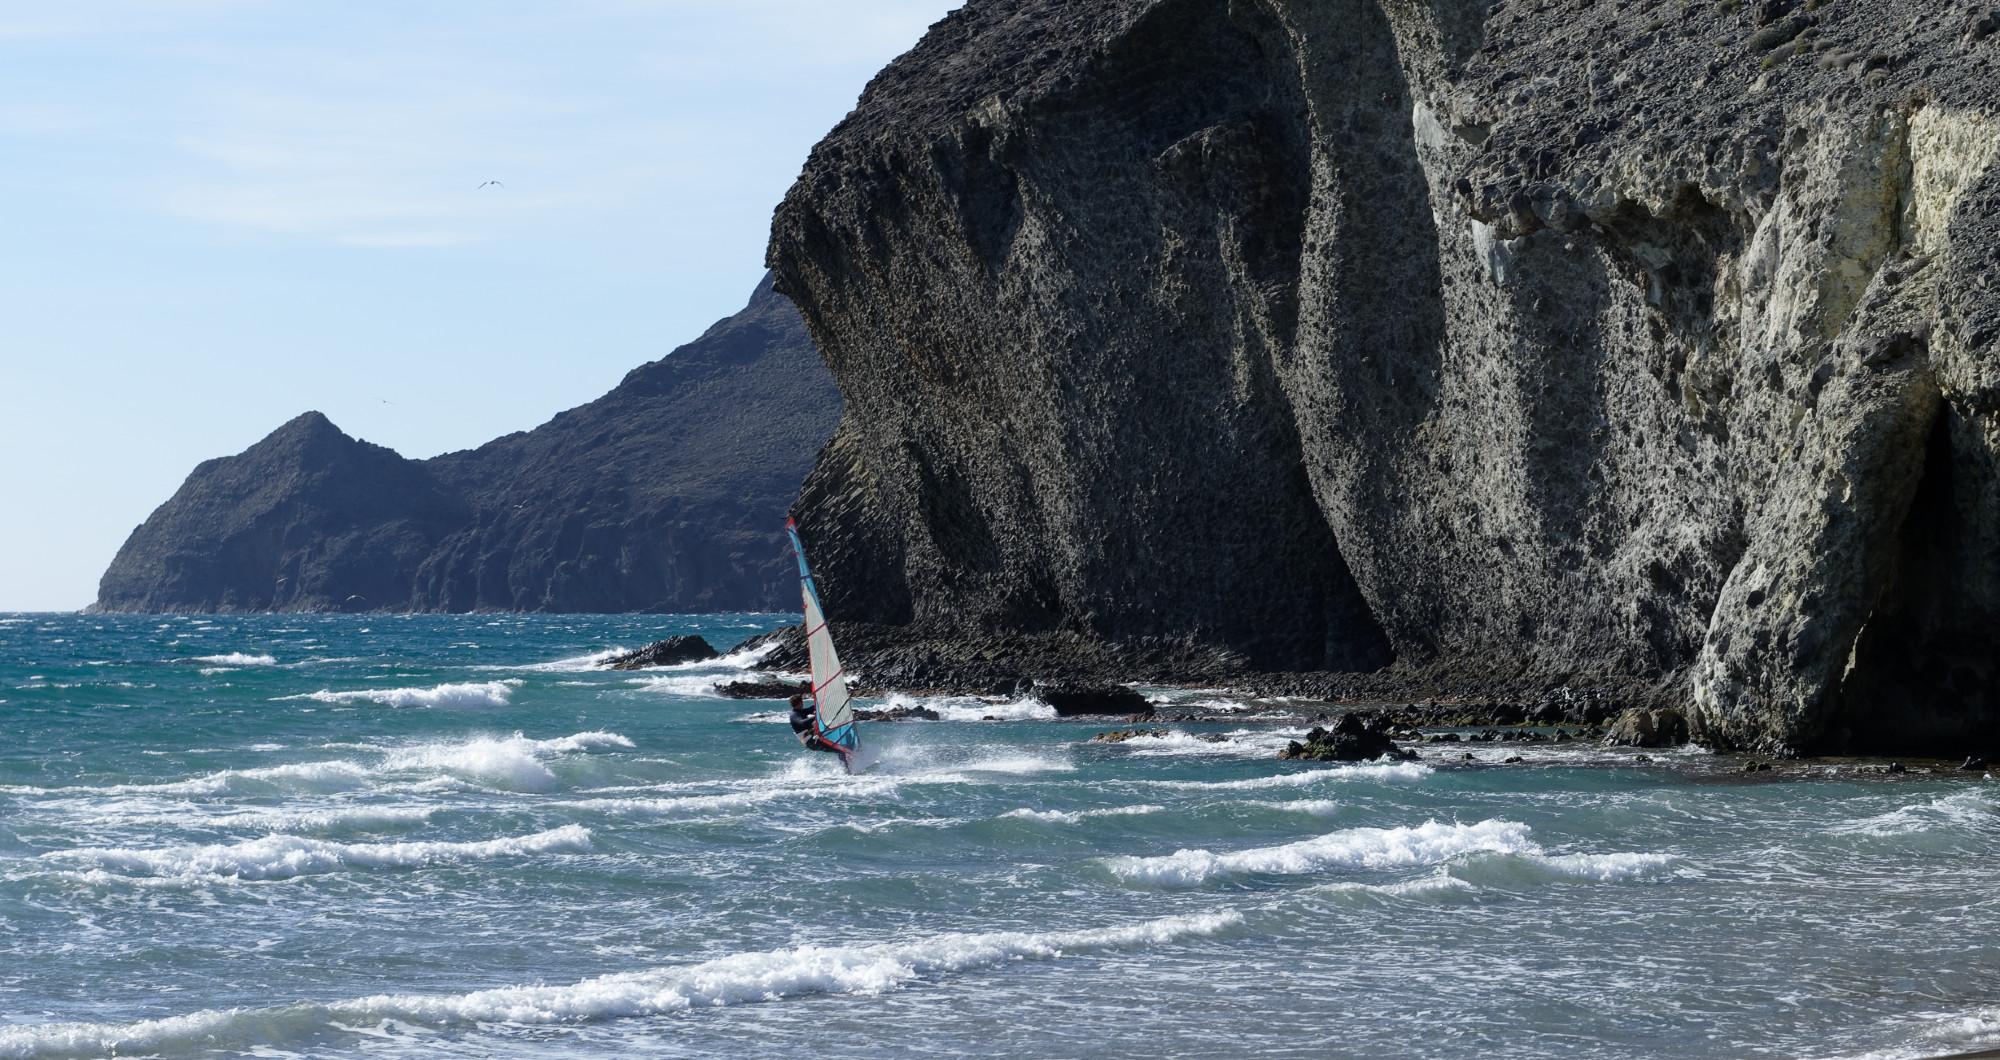 171214-San Jose-Playa del Monsul (Cabo de Gata-Andalousie) (196)